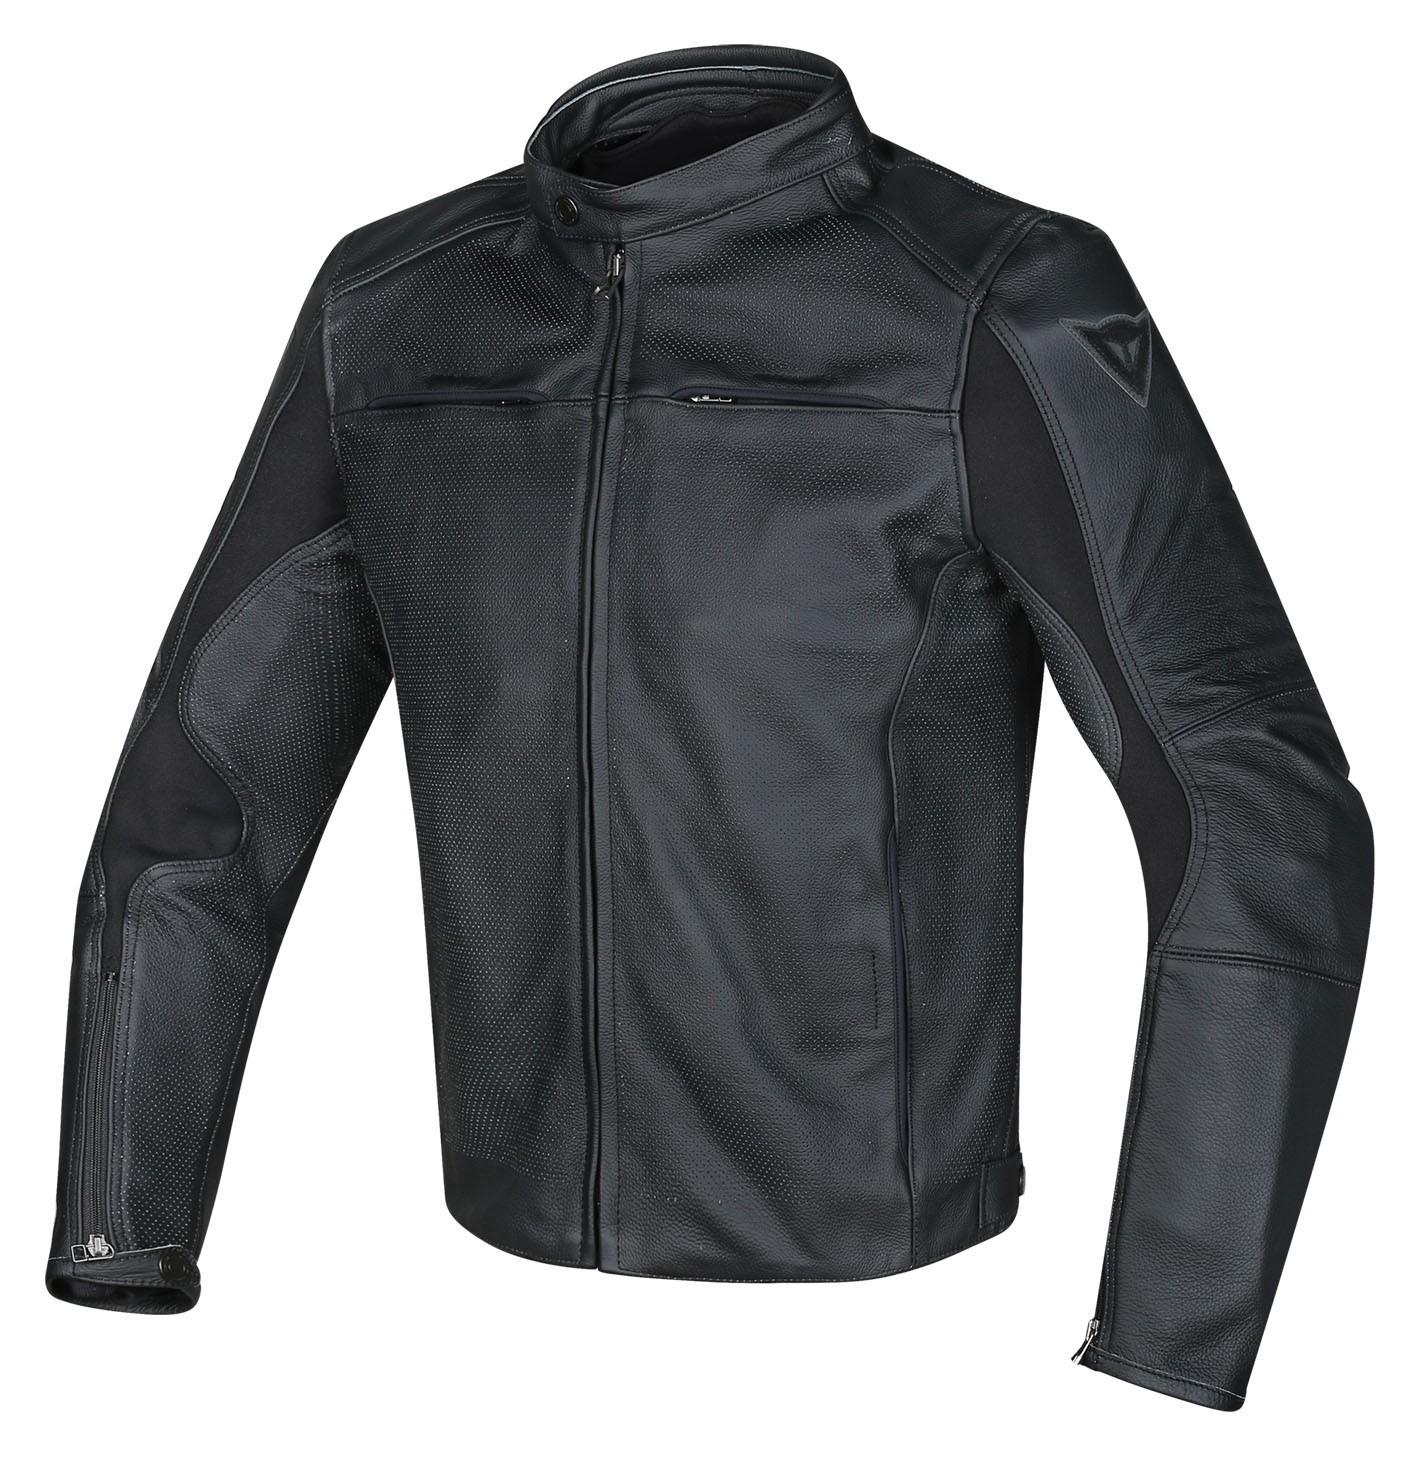 dainese razon perforated leather jacket - revzilla